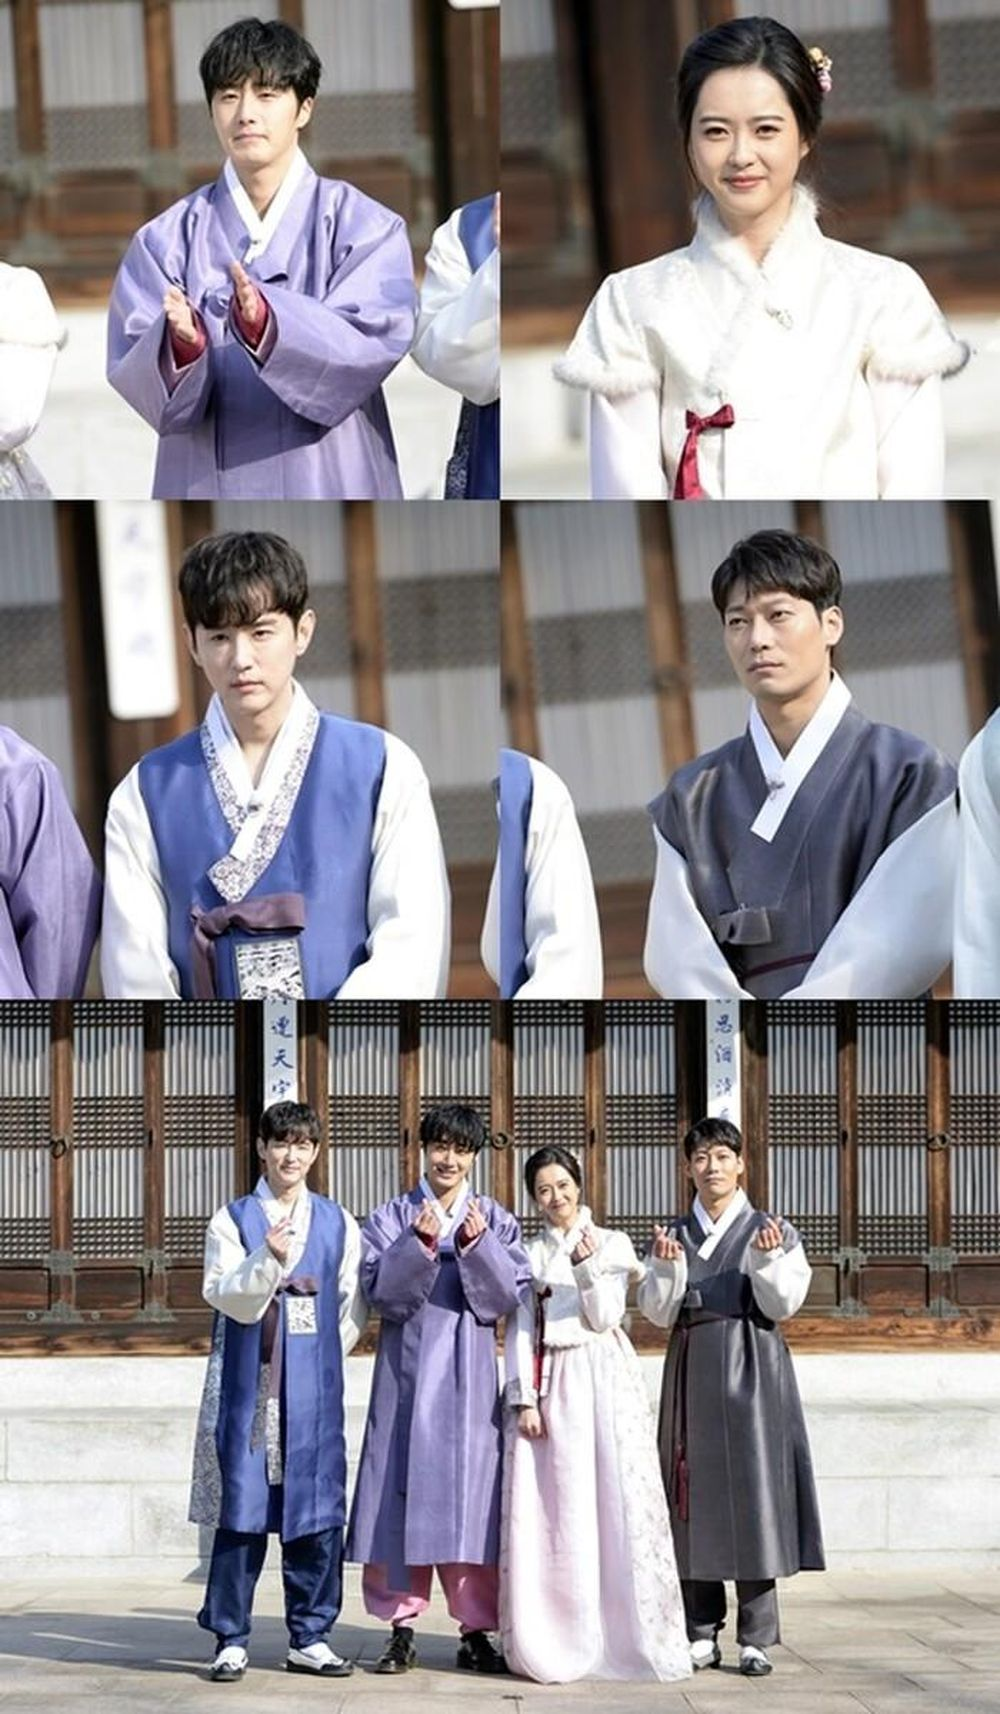 haechi tiết lộ ảnh chuc tết tươi trẻ của go ara jung il woo va kwon yul saostar go ara jung il woo va kwon yul